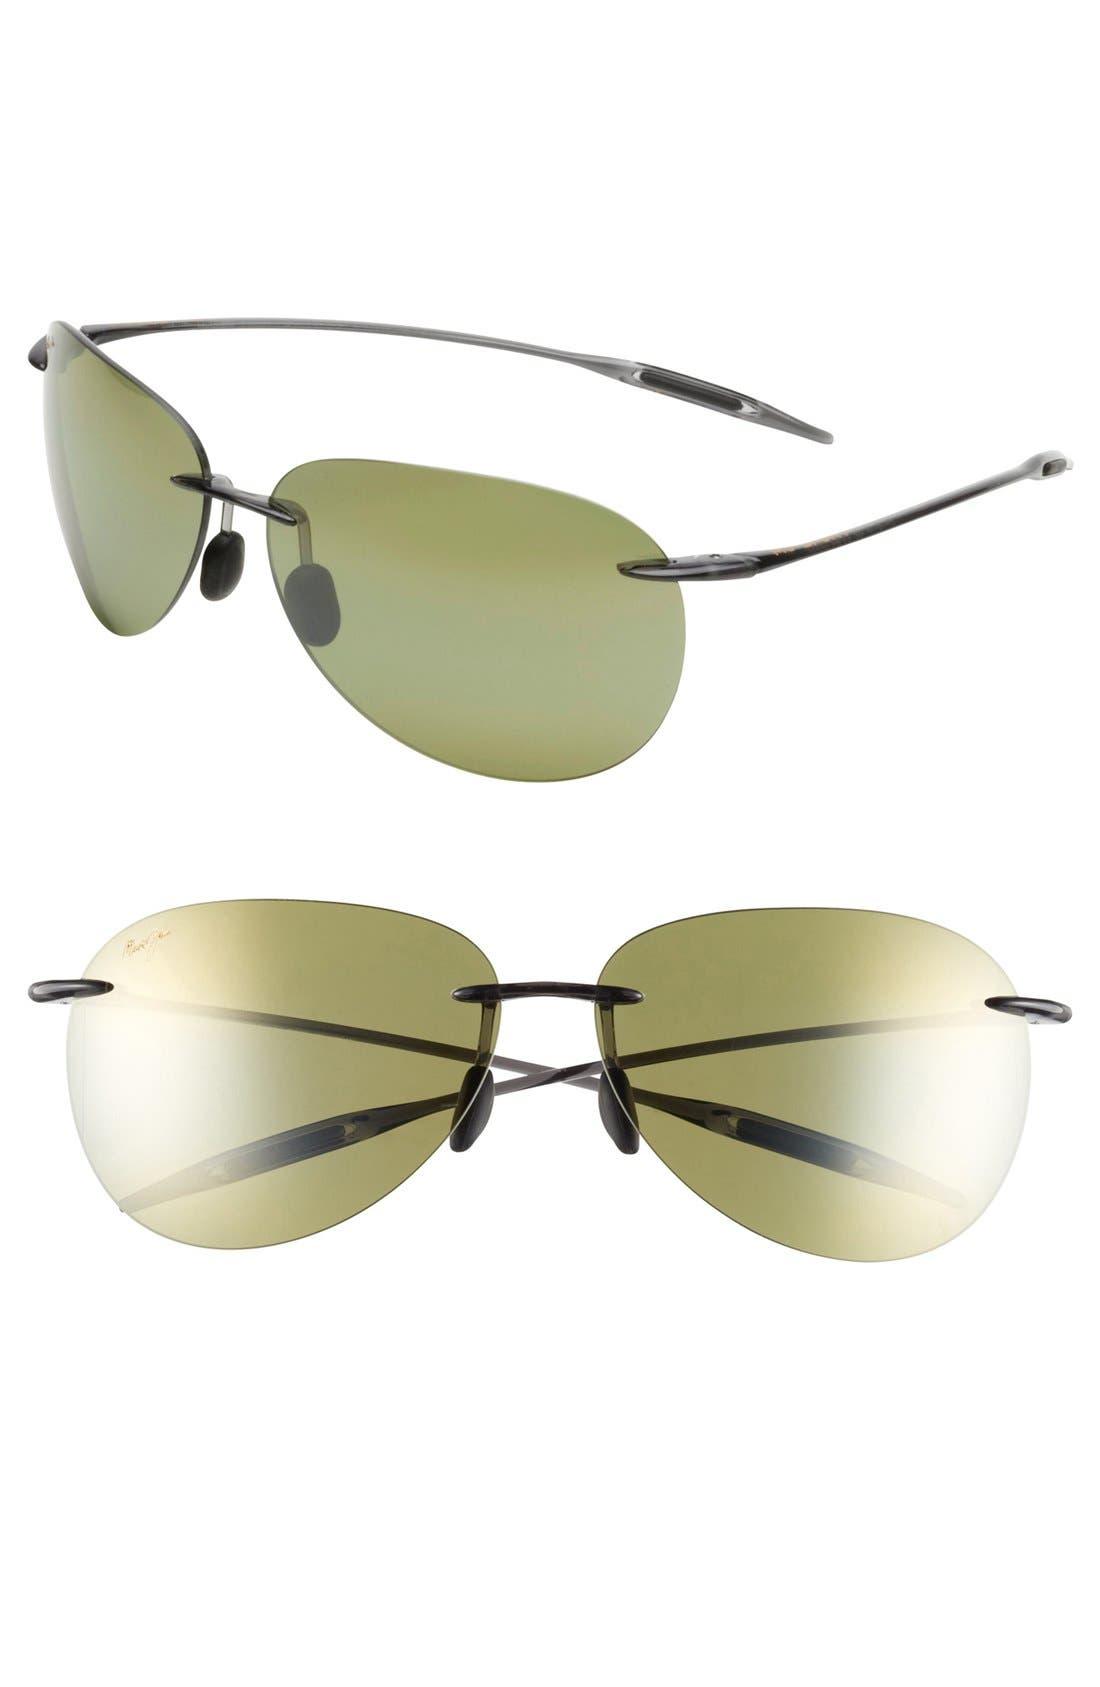 Main Image - Maui Jim 'Sugar Beach' 62mm Sunglasses